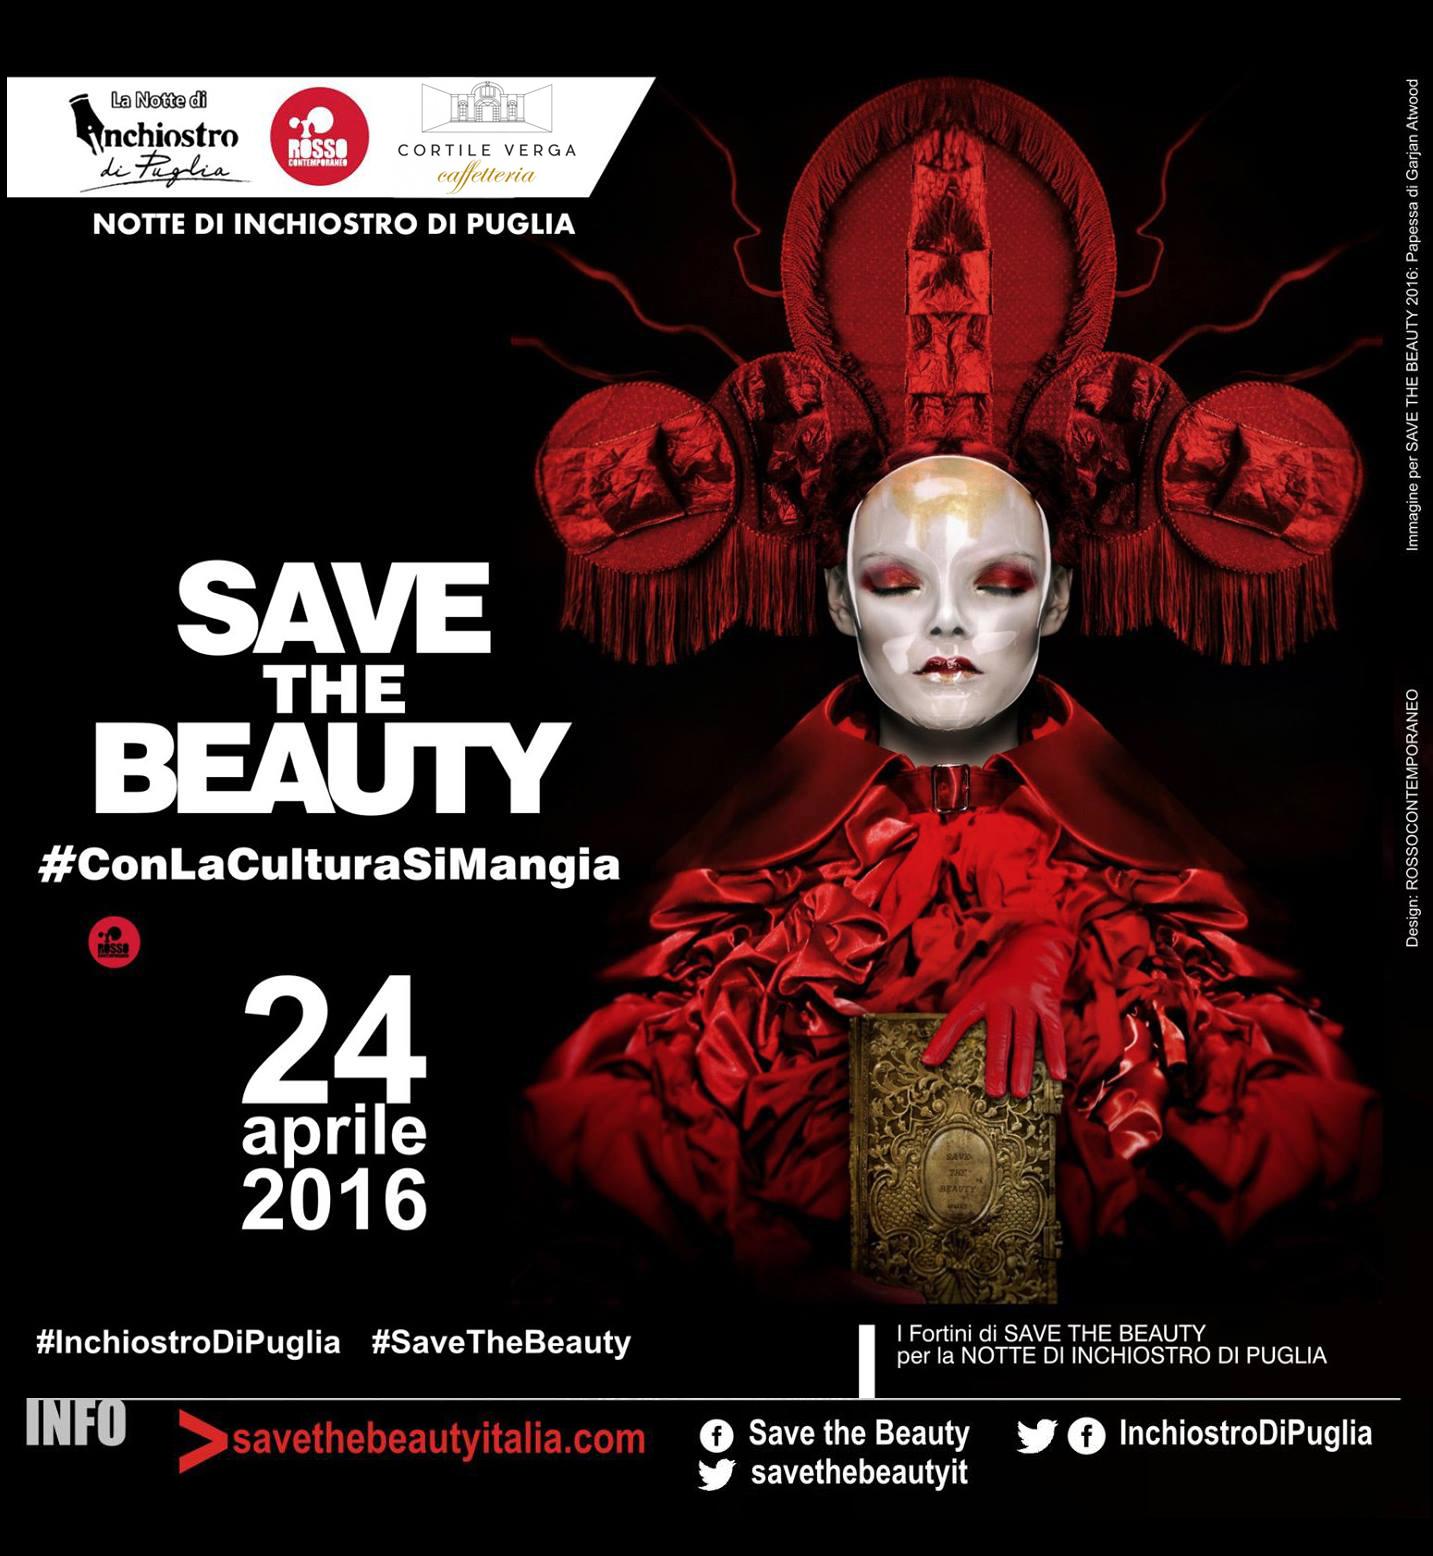 Save The Beauty a Cortile Verga